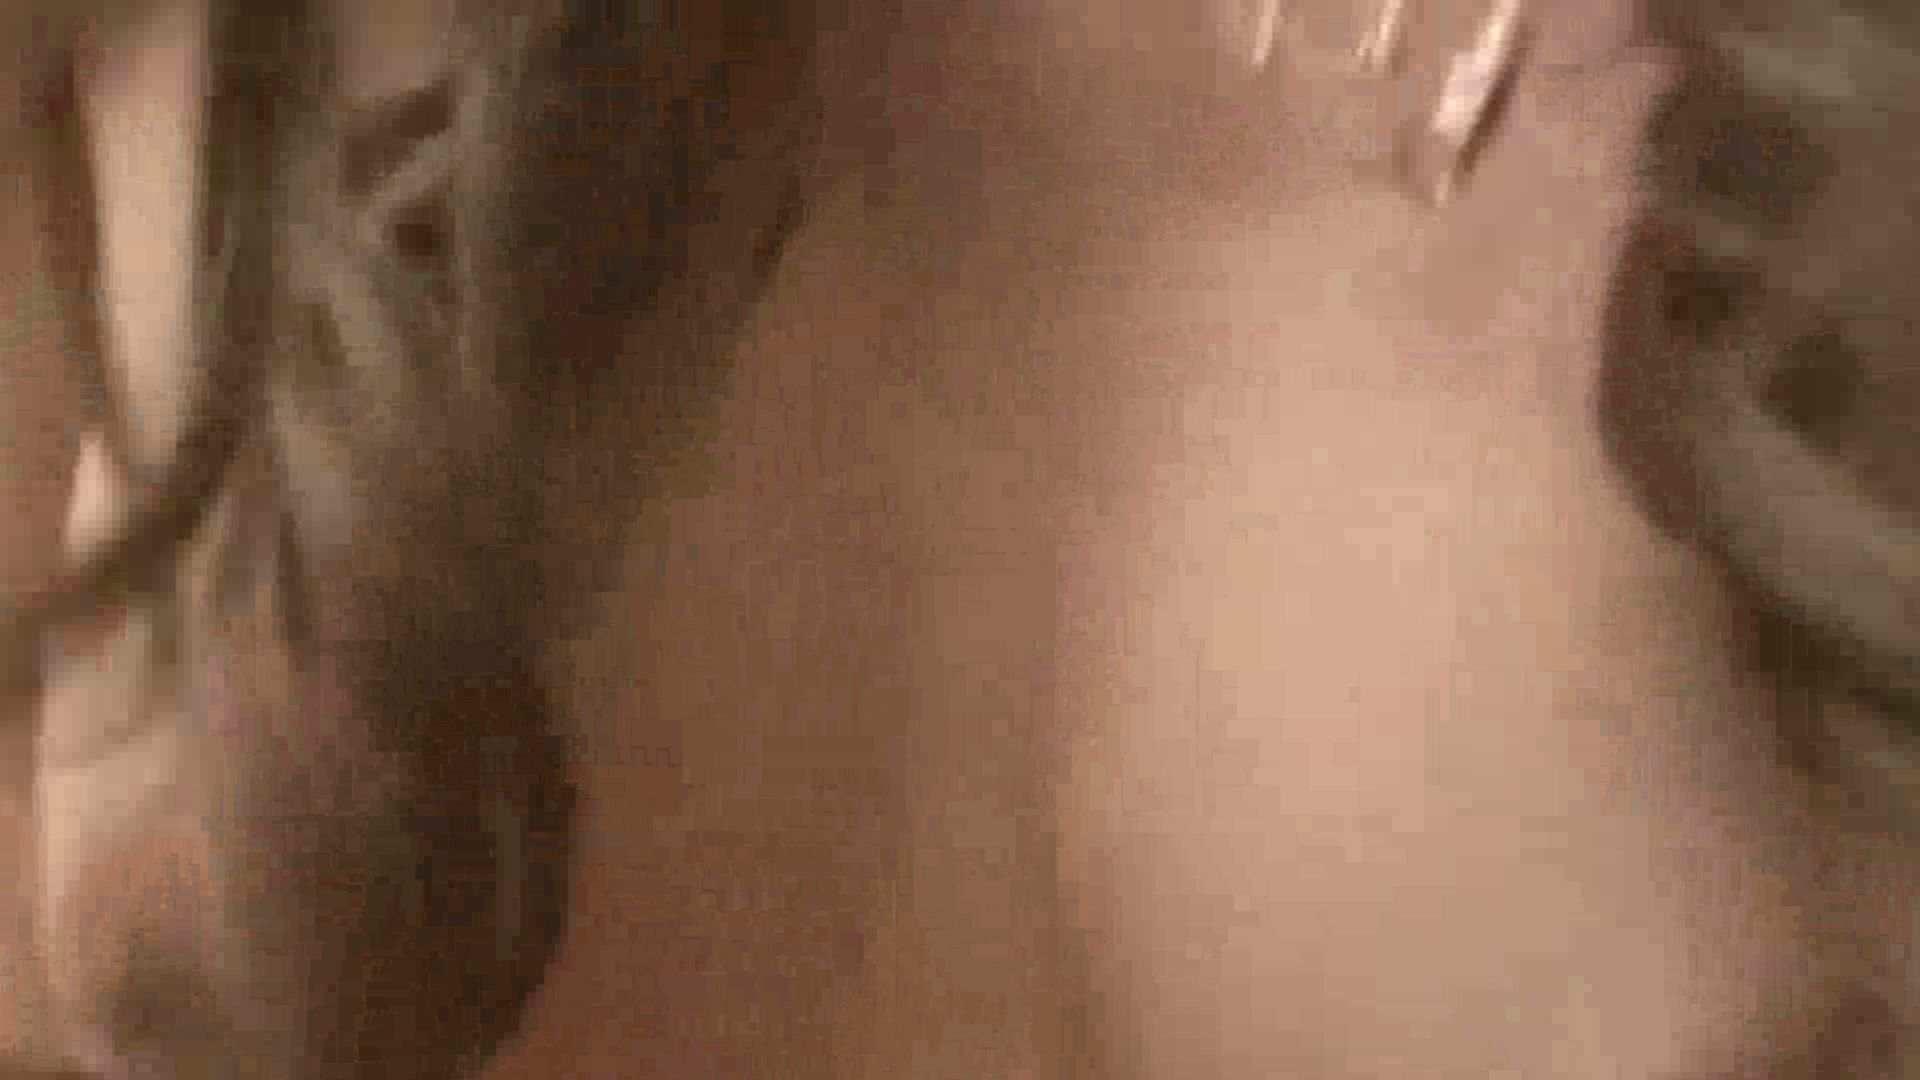 S級厳選美女ビッチガールVol.25 OLセックス  61画像 6